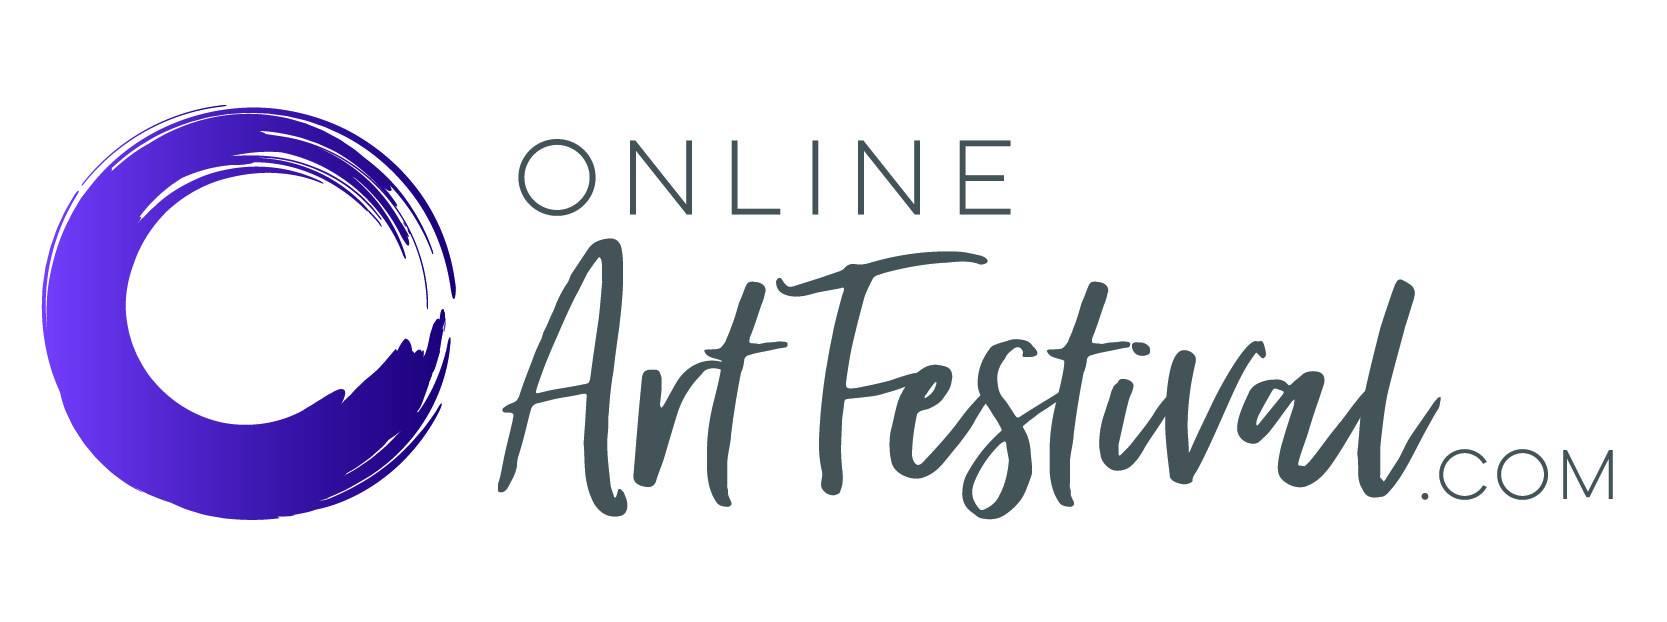 OnlineArtFestival. com